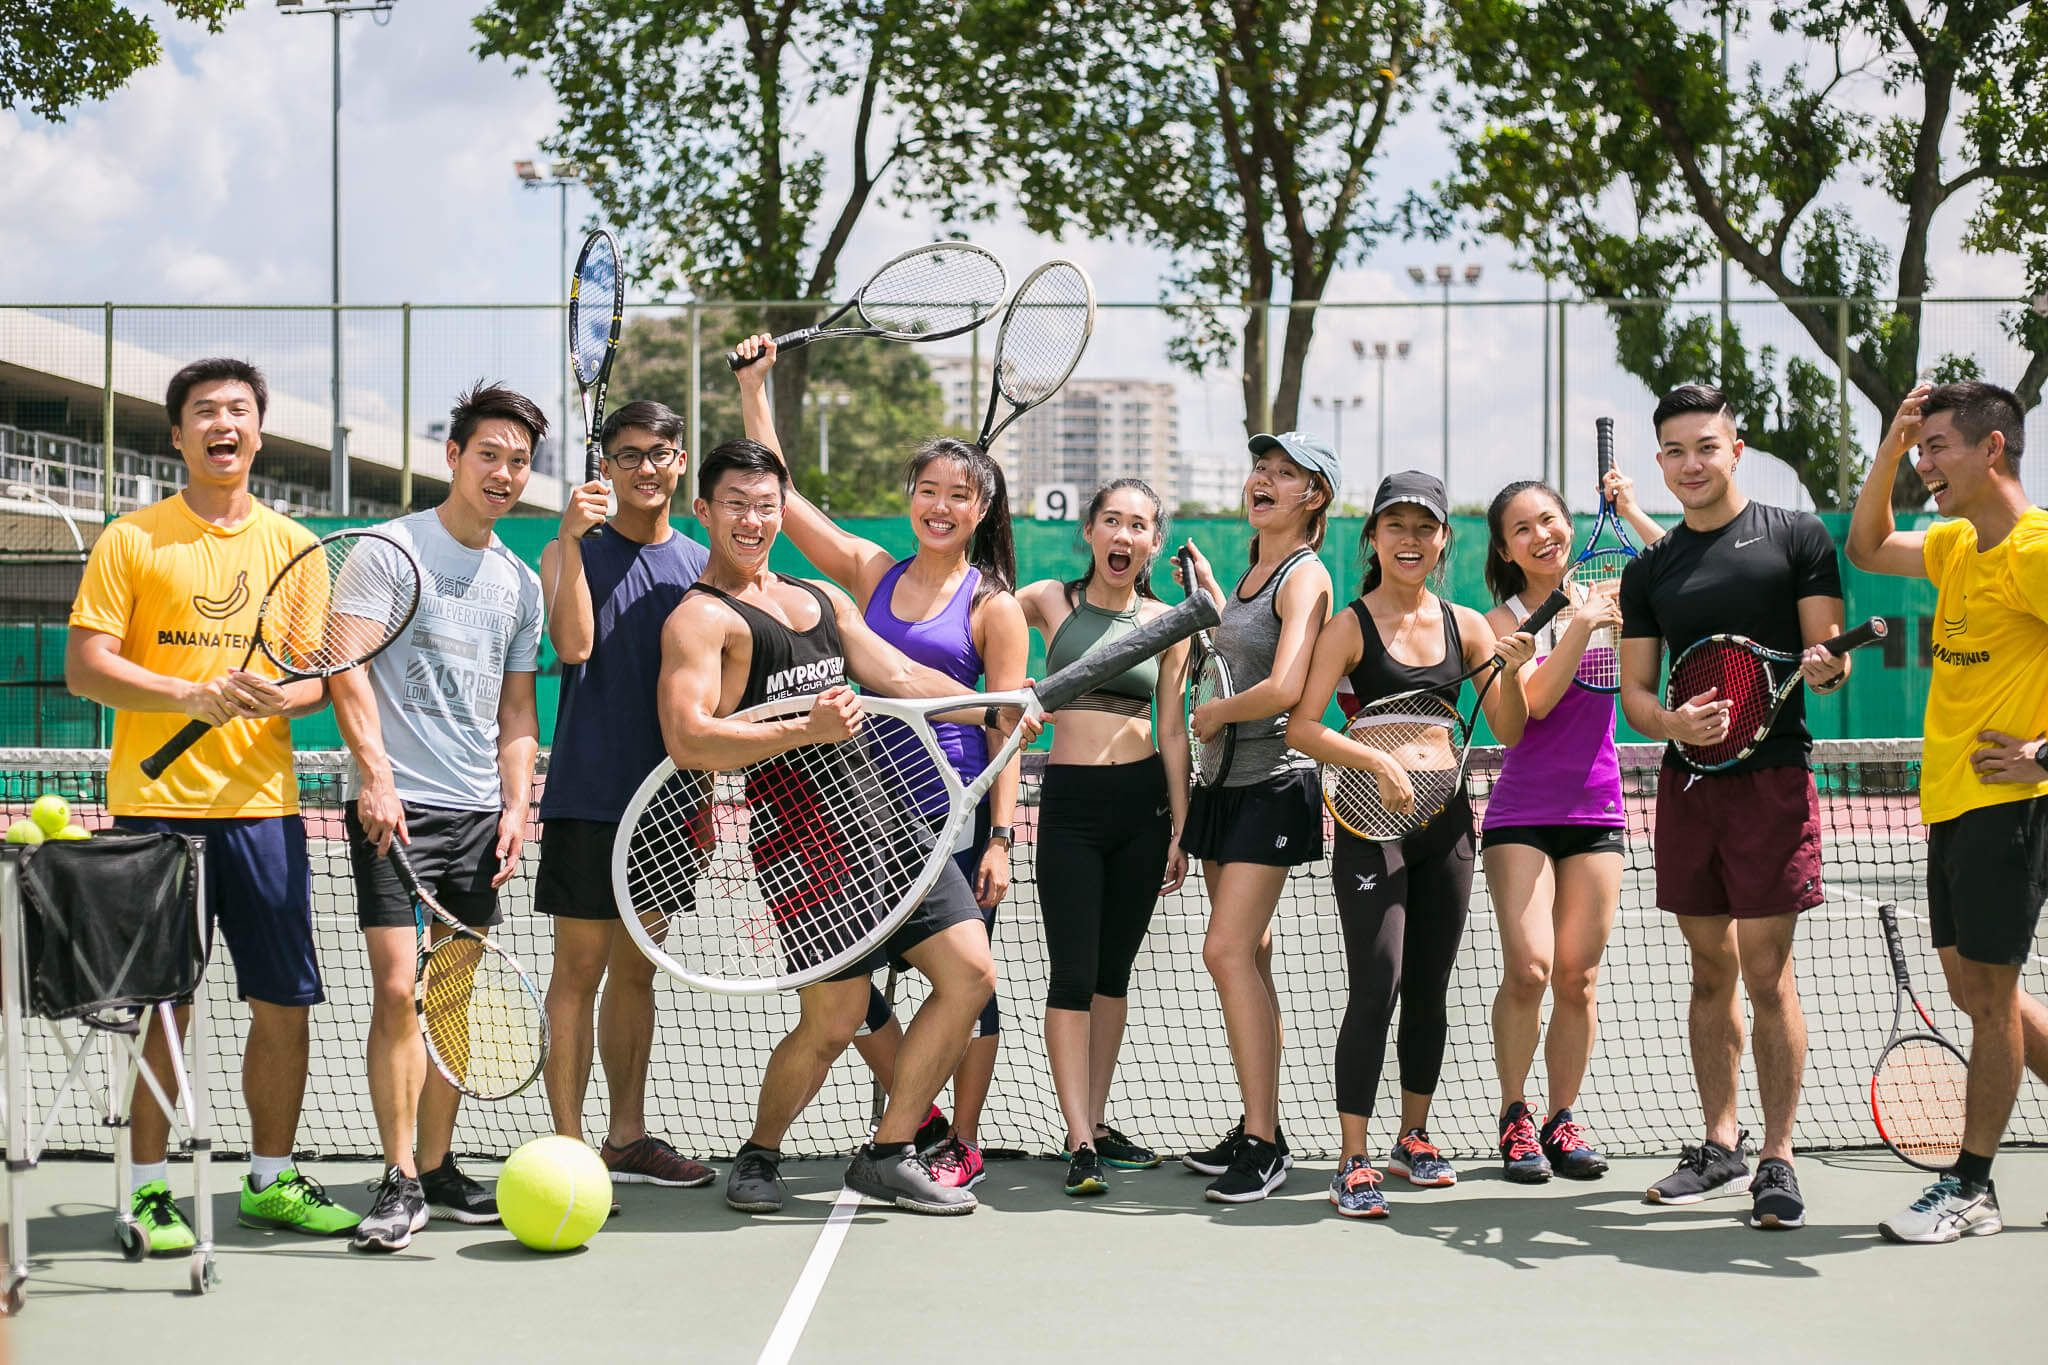 Tennis Lessons Singapore Banana Tennis Academy Tennis Lessons Tennis Tennis Coach